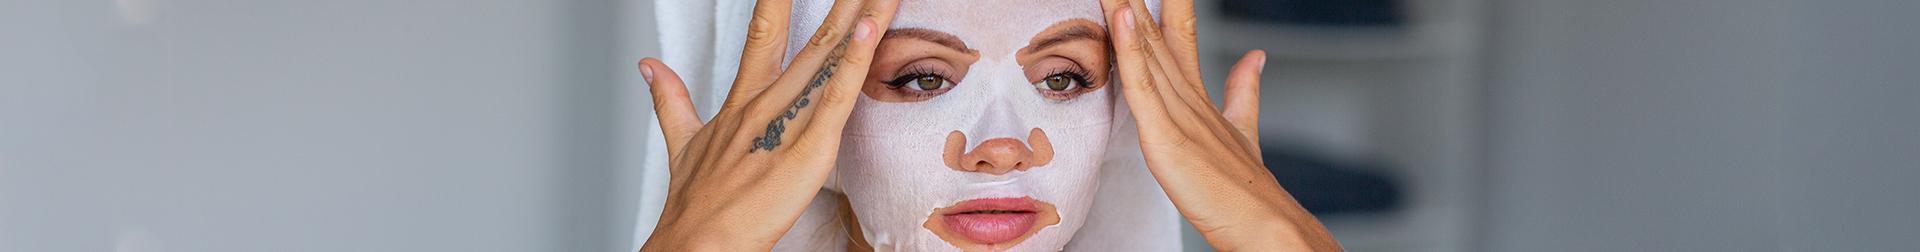 Skin Treatments | Buy Best Skin Care Creams & Lotions | AromaCraze